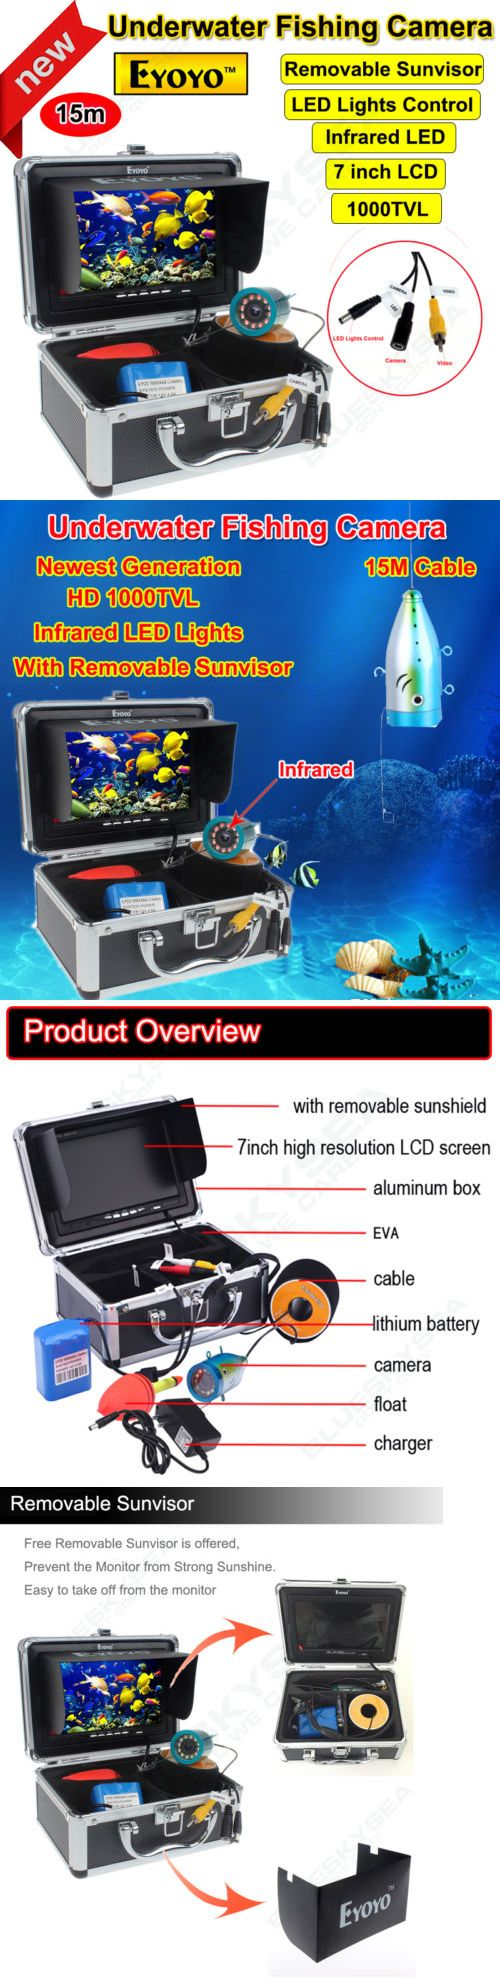 Underwater Cameras 180000: Eyoyo 7 Lcd 15M Infrared 1000Tvl Fish Finder Underwater Fishing Camera Monitor -> BUY IT NOW ONLY: $121.88 on eBay!